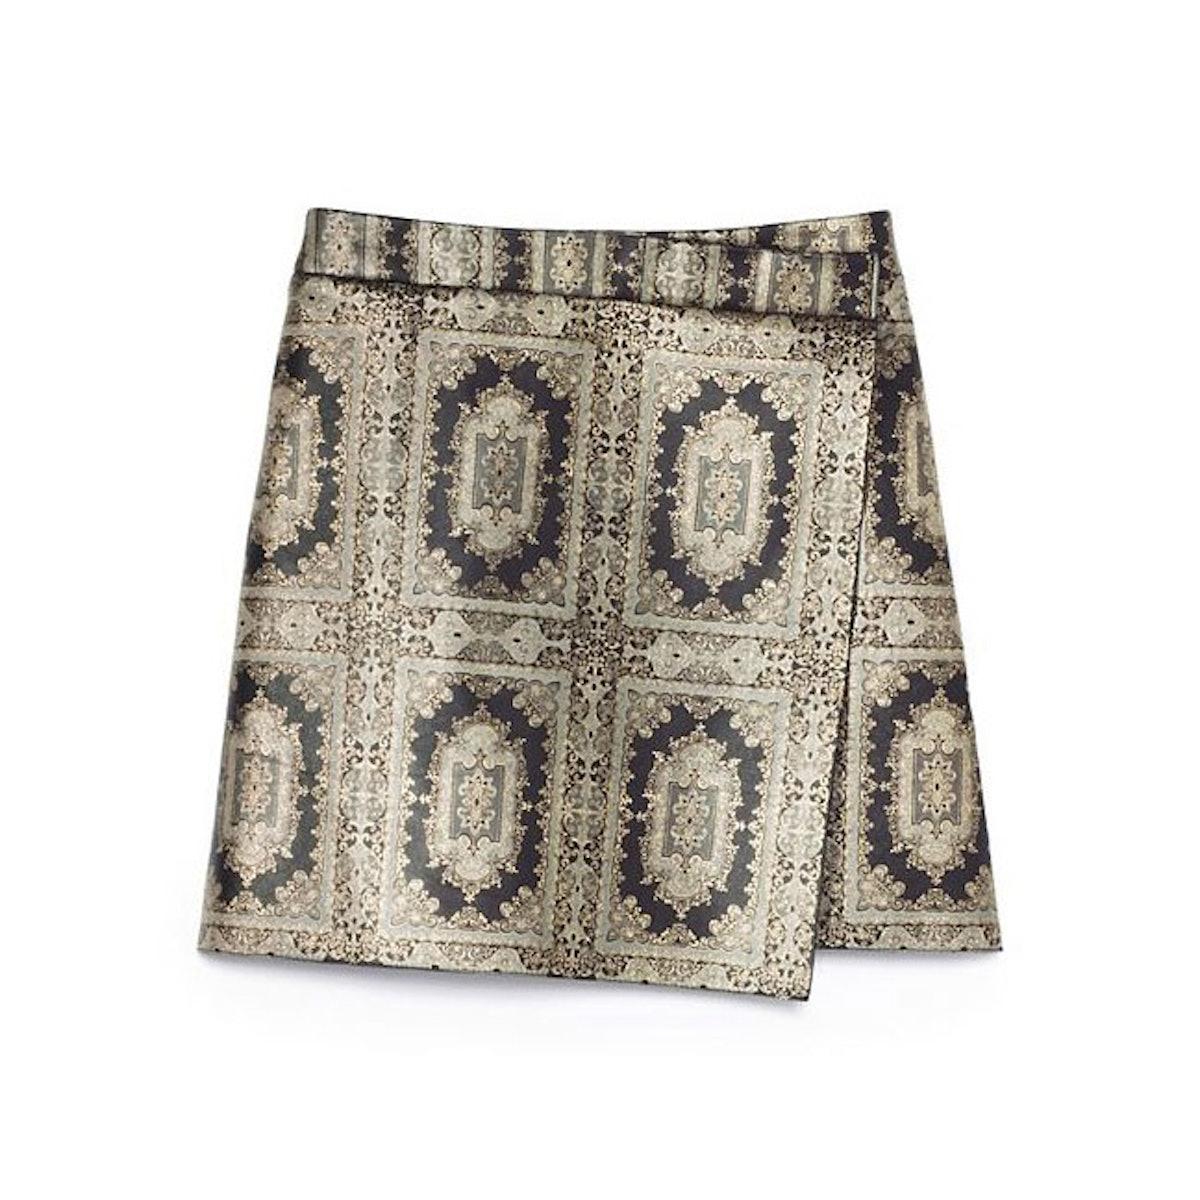 Tory Burch embellished kilt skirt